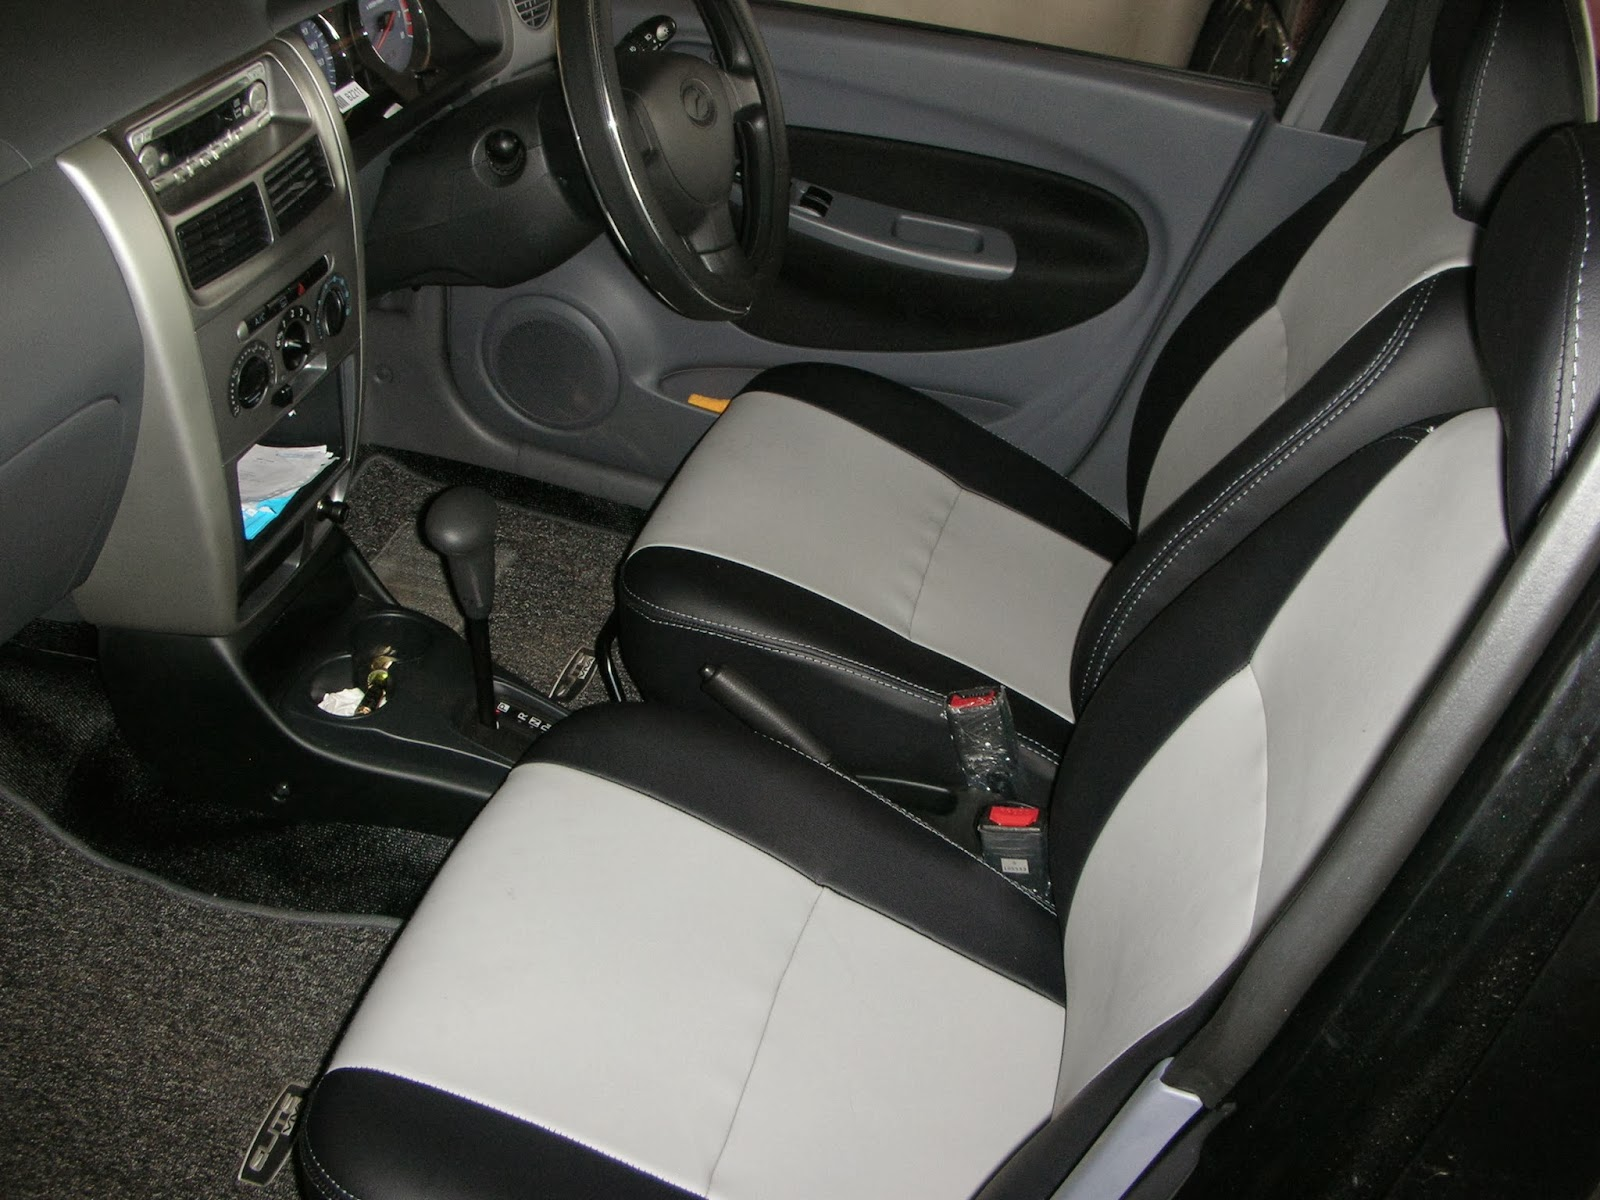 viva elite leather seat covers two tone design vip car interiors srilanka. Black Bedroom Furniture Sets. Home Design Ideas